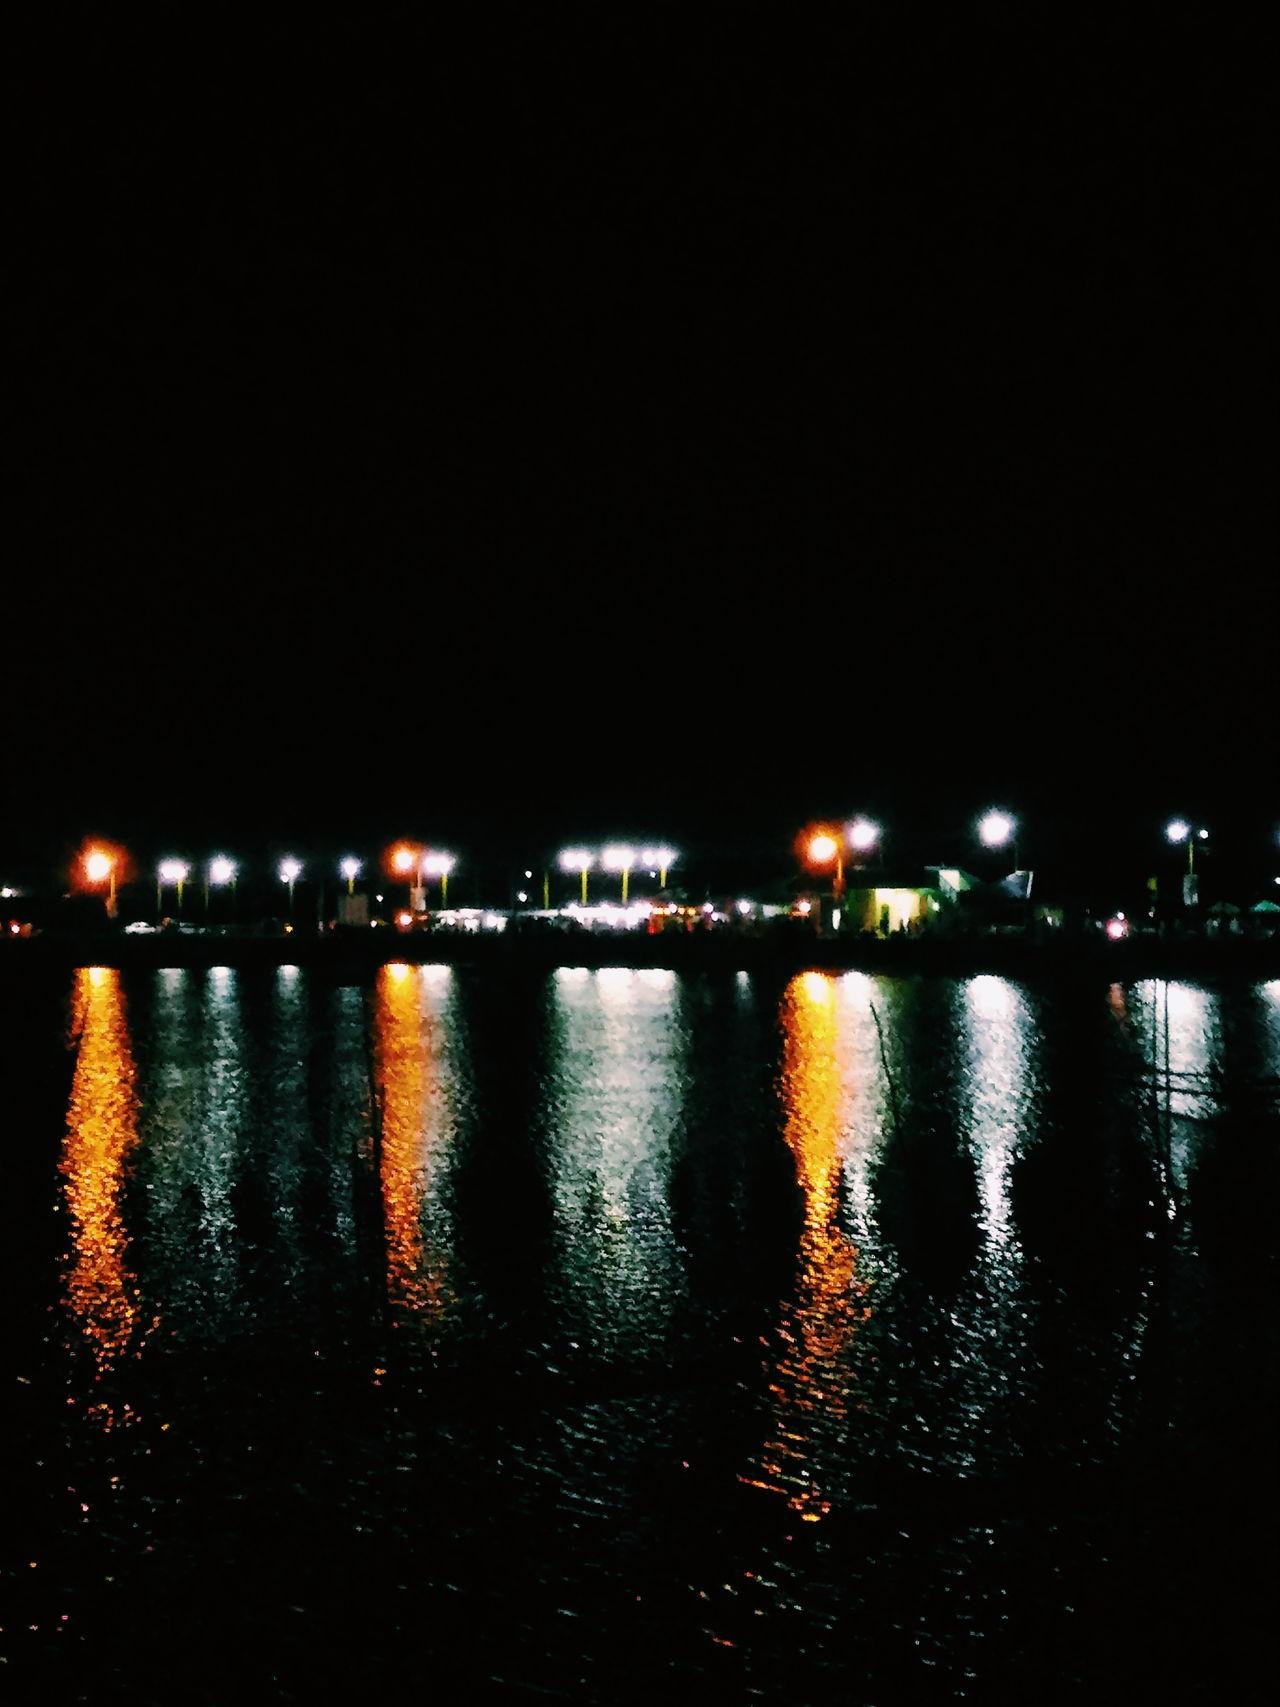 Sorsogon Baywalk Baywalk Nightwalk Sorsogoncity Reflection Reflections In The Water